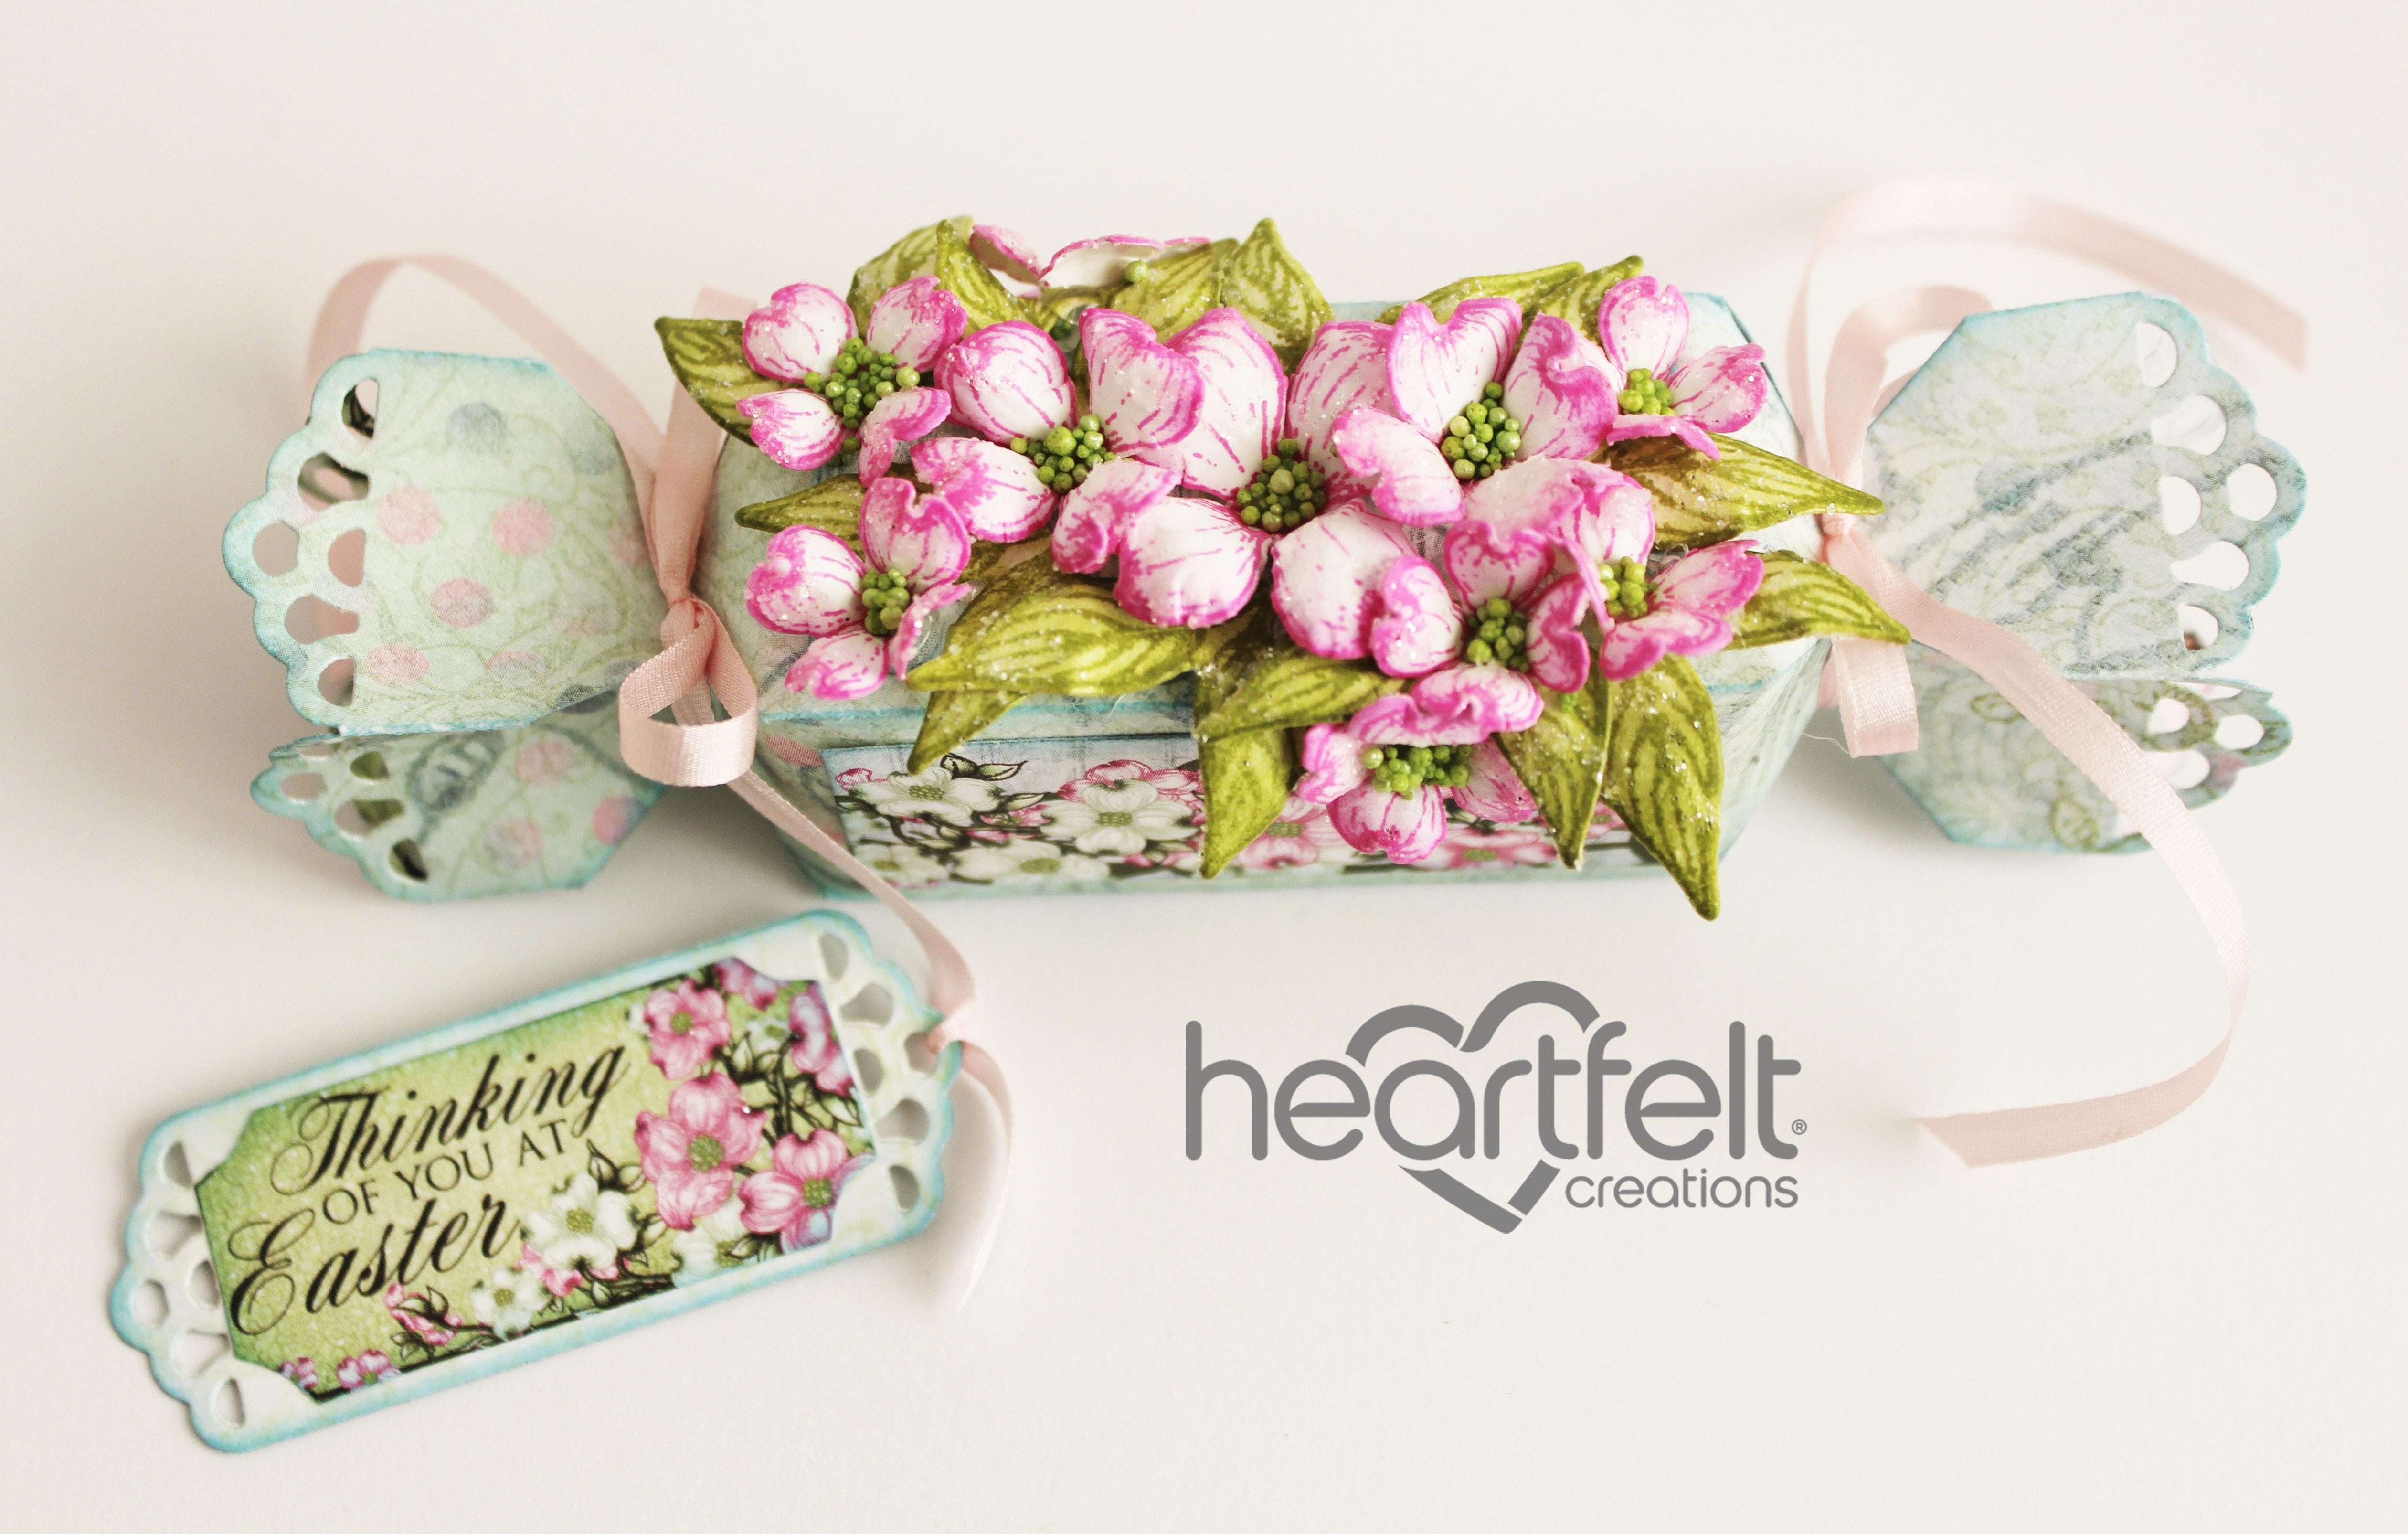 Gallery   Pink Dogwood Easter Treat Box - Heartfelt Creations